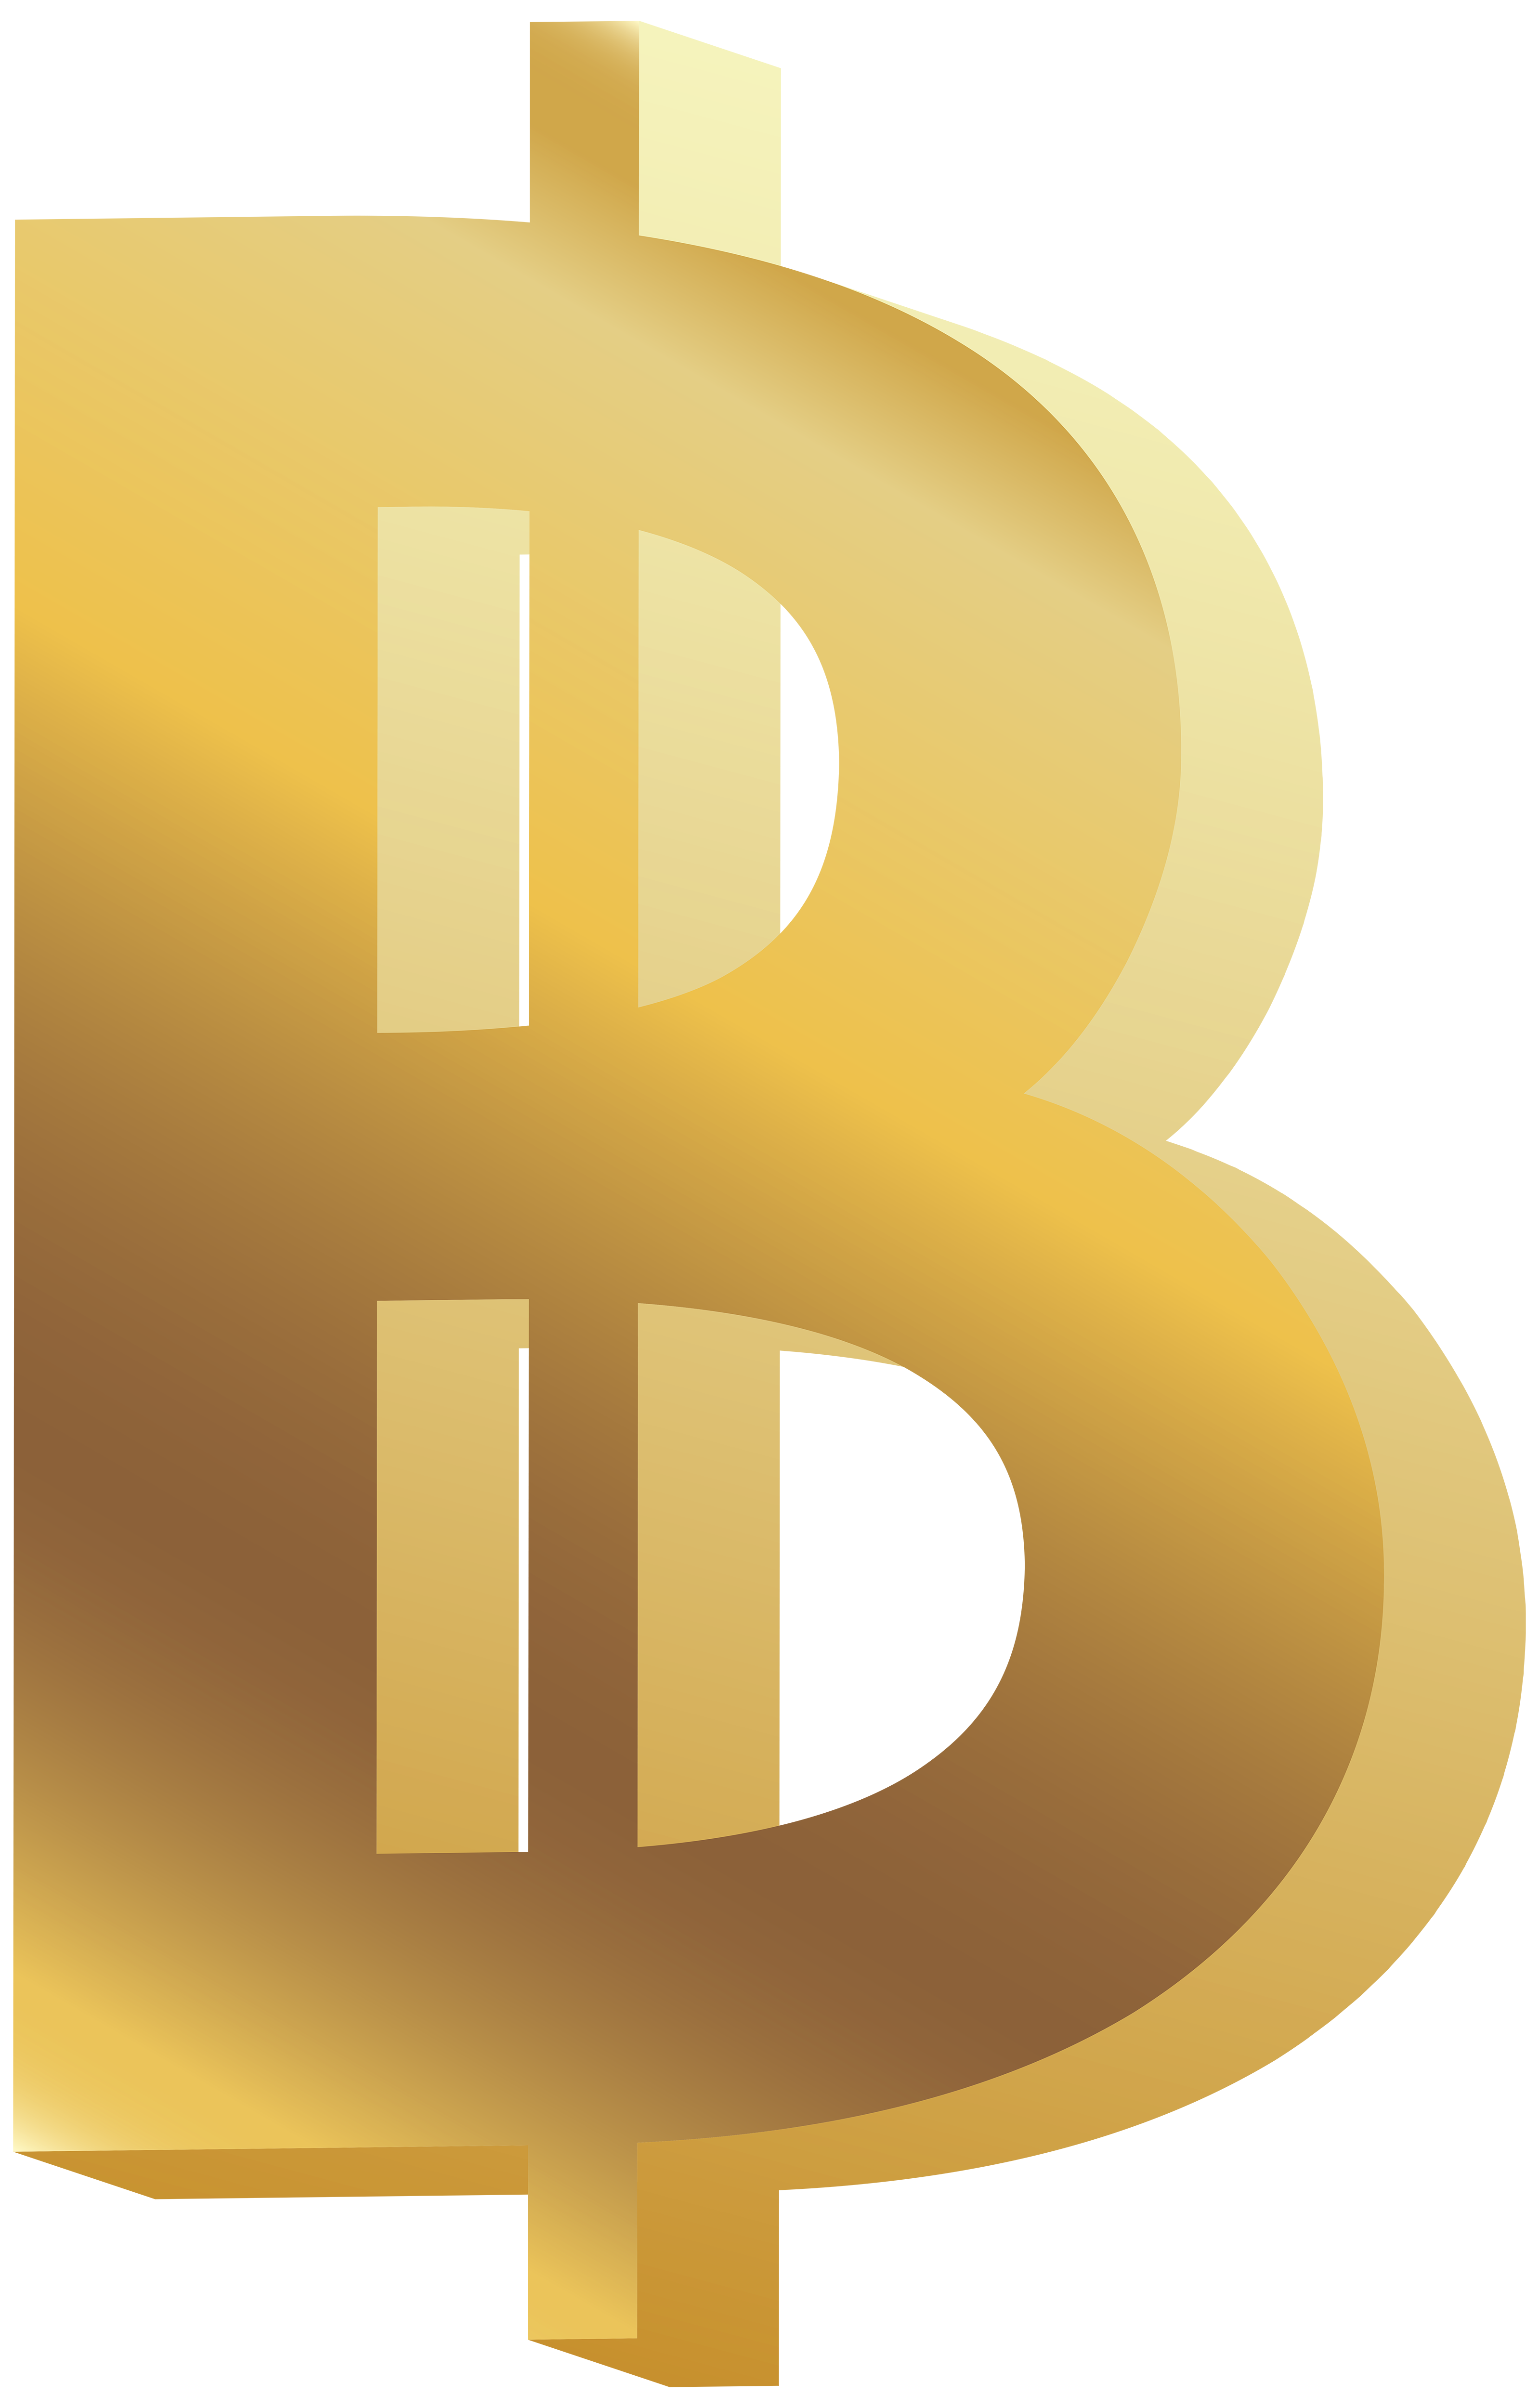 Baht symbol png clip. Computer clipart money